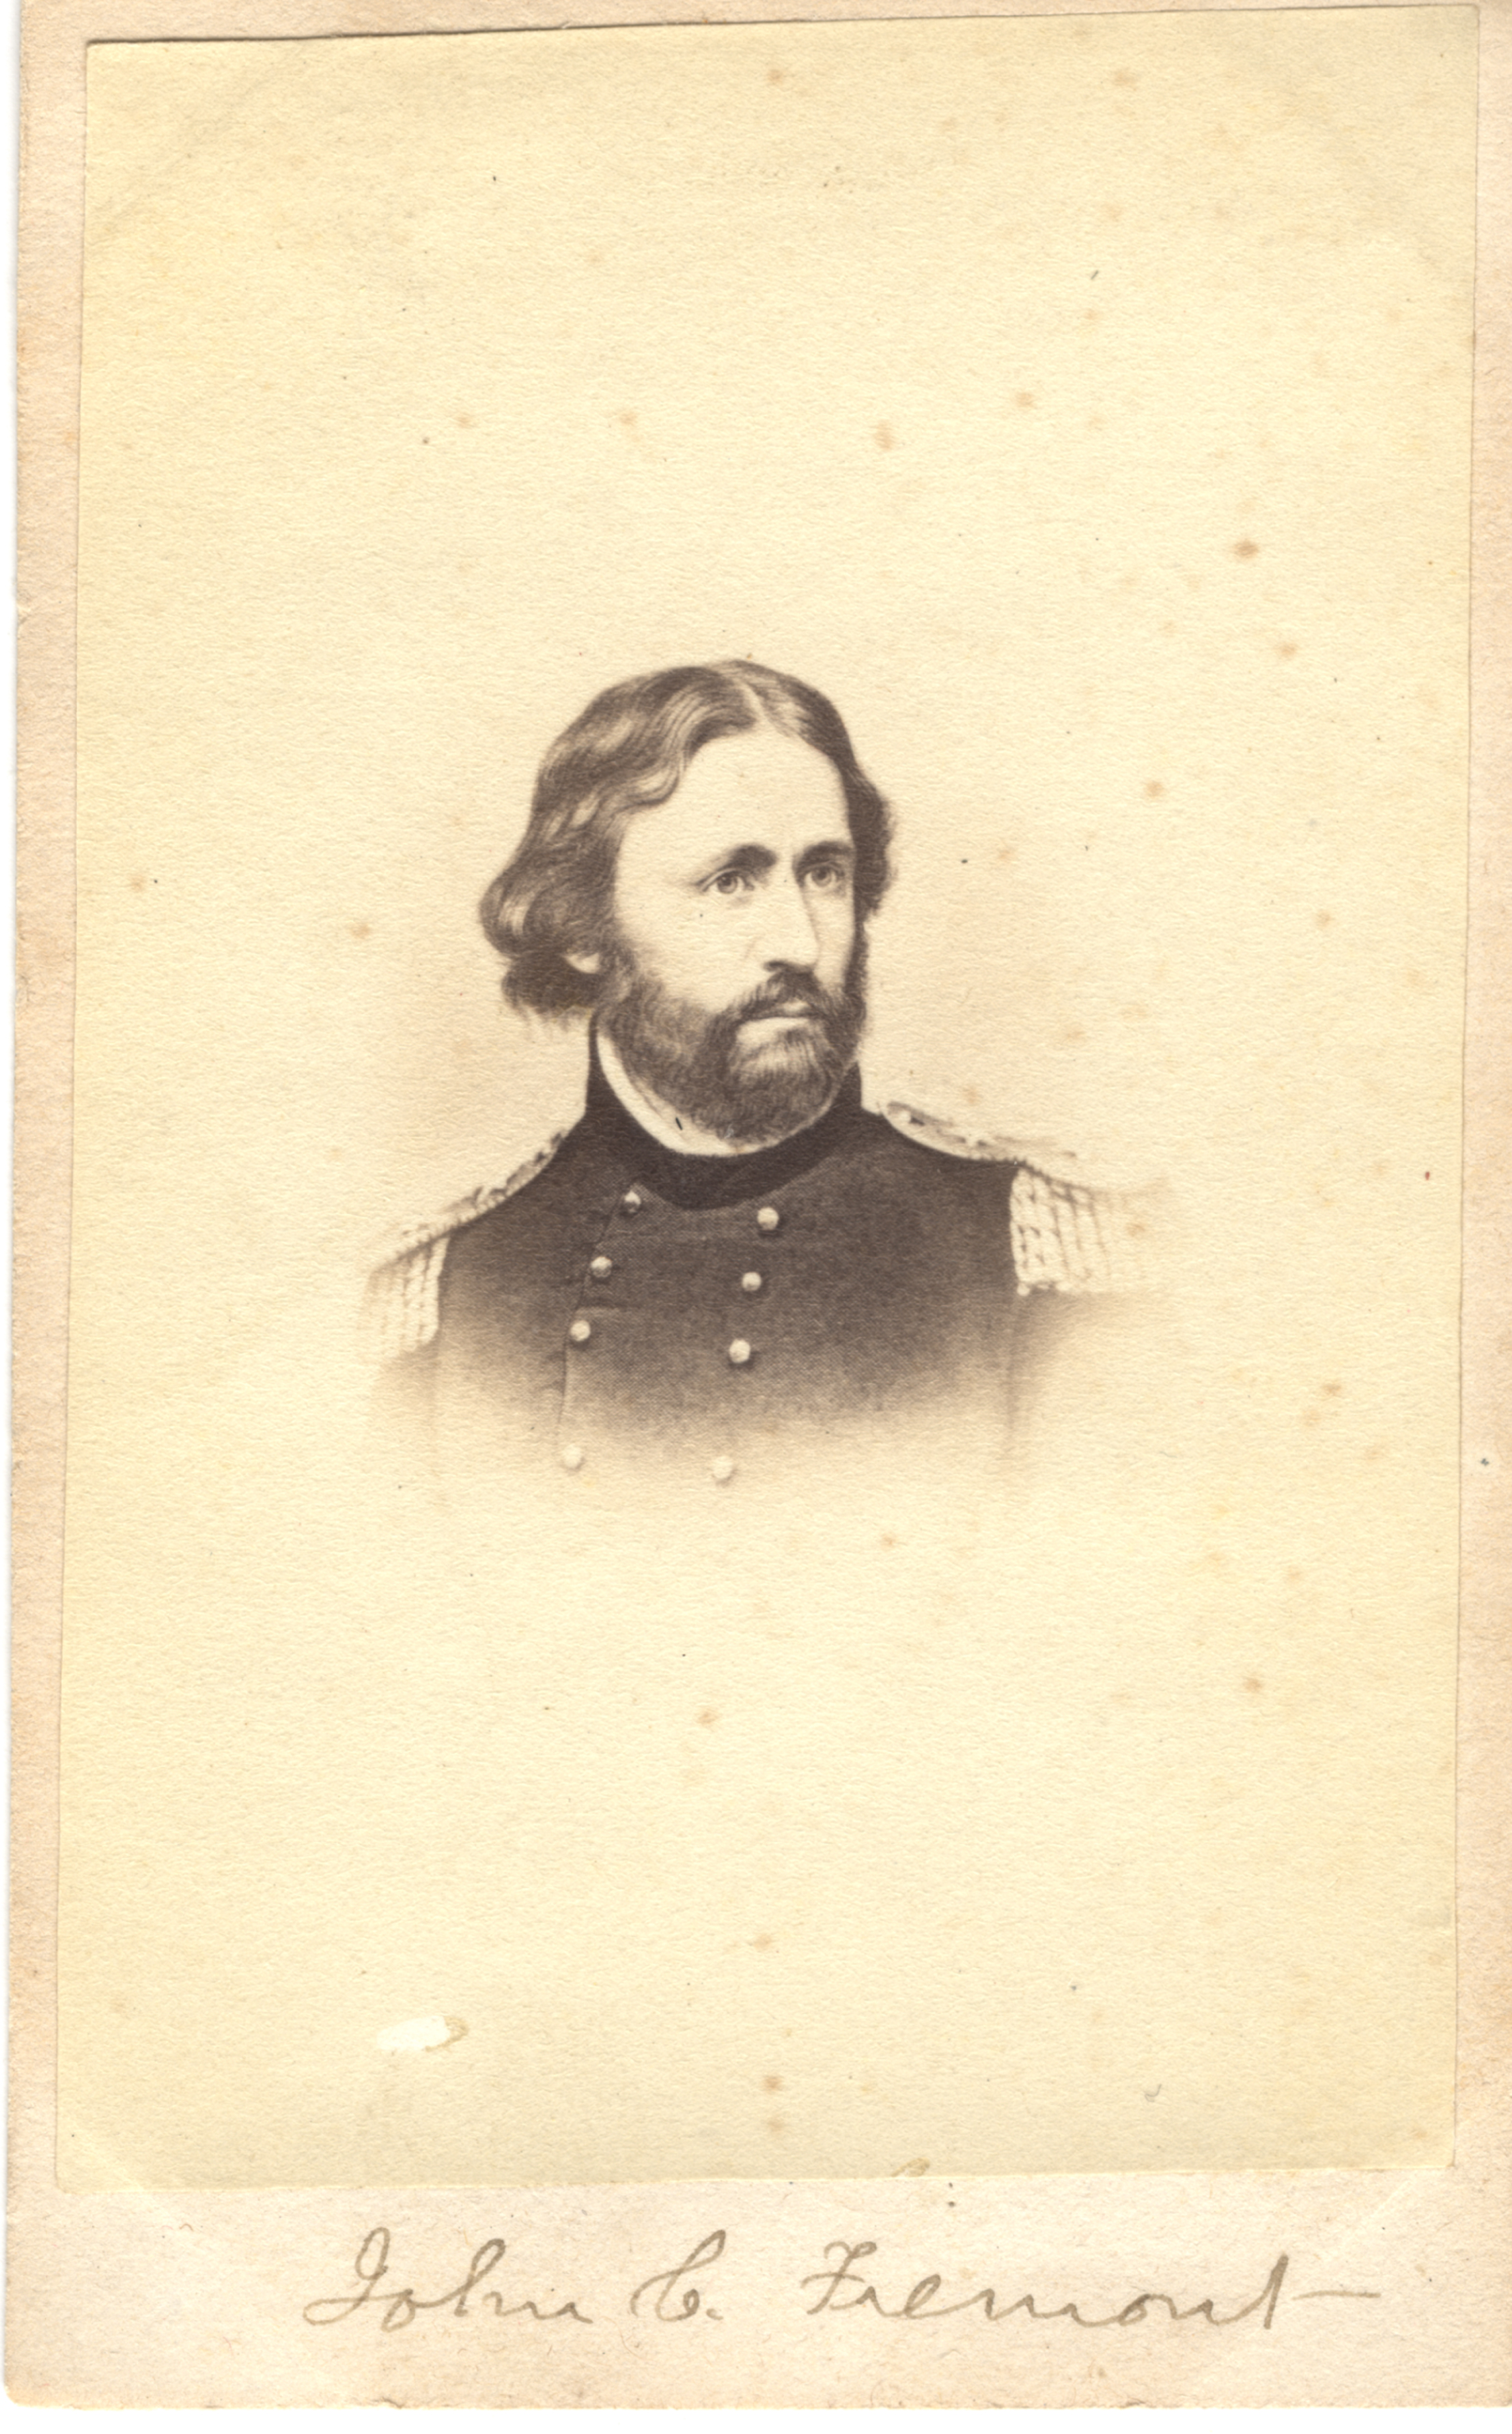 John C. Fremont, circa 1860s